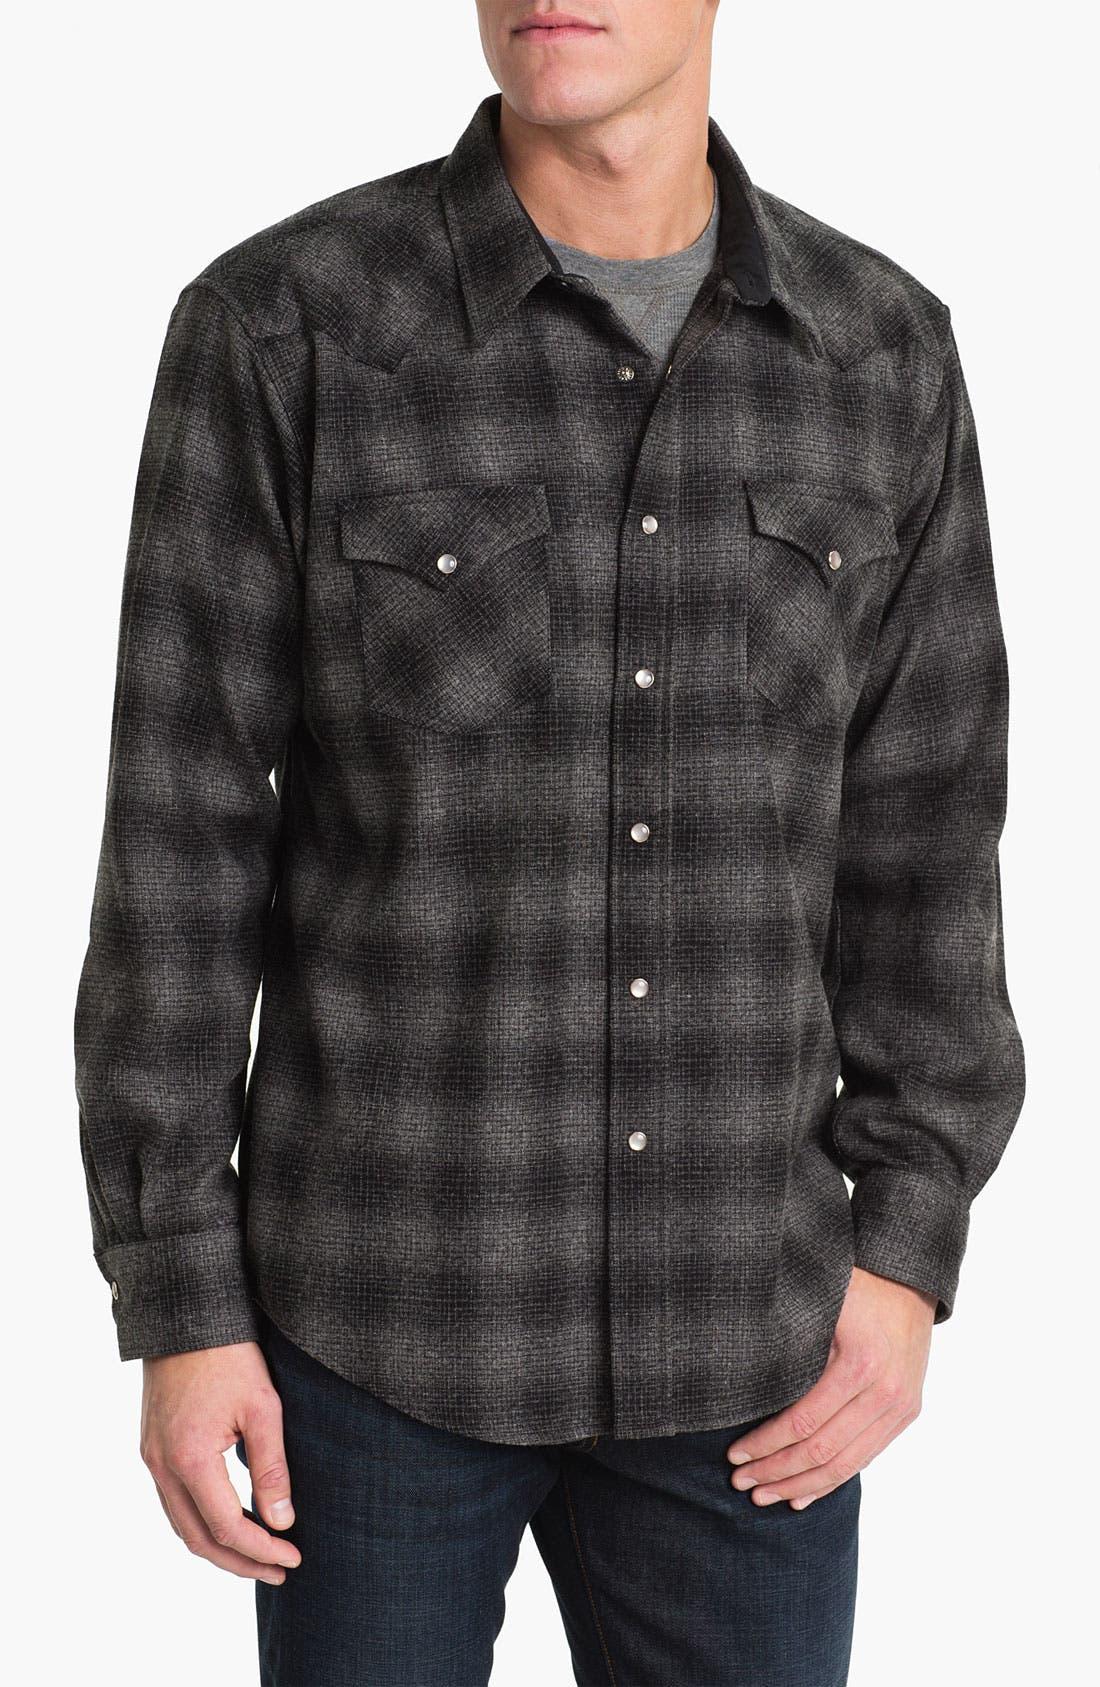 Main Image - Pendleton 'Canyon' Fitted Wool Shirt